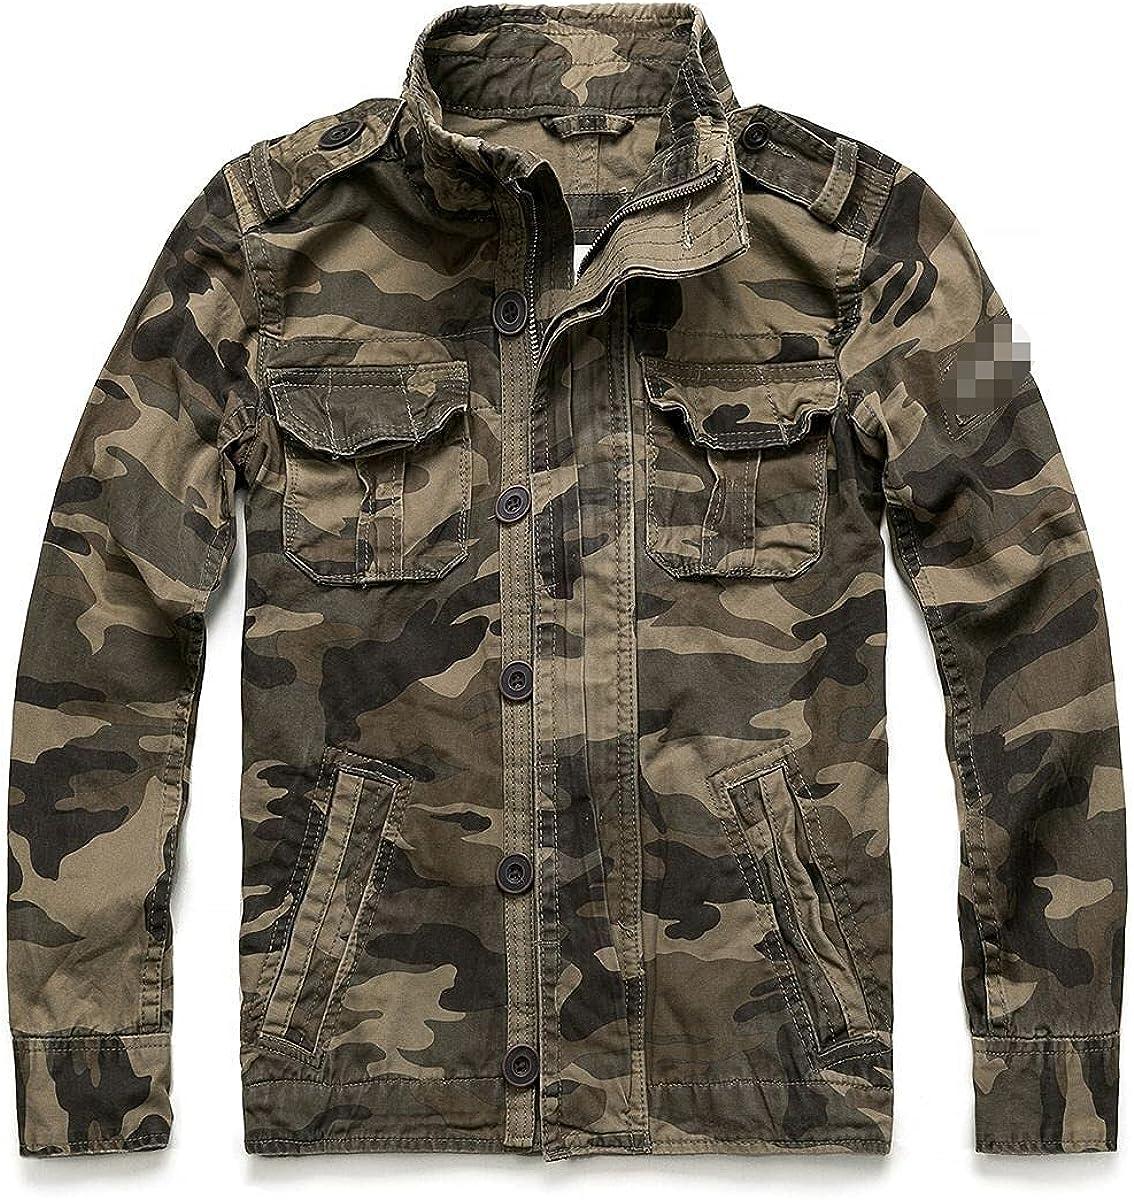 Camouflage Bomber Jacket Men's Retro Military Pocket Denim Jacket Military Coat Casual Men's Cotton